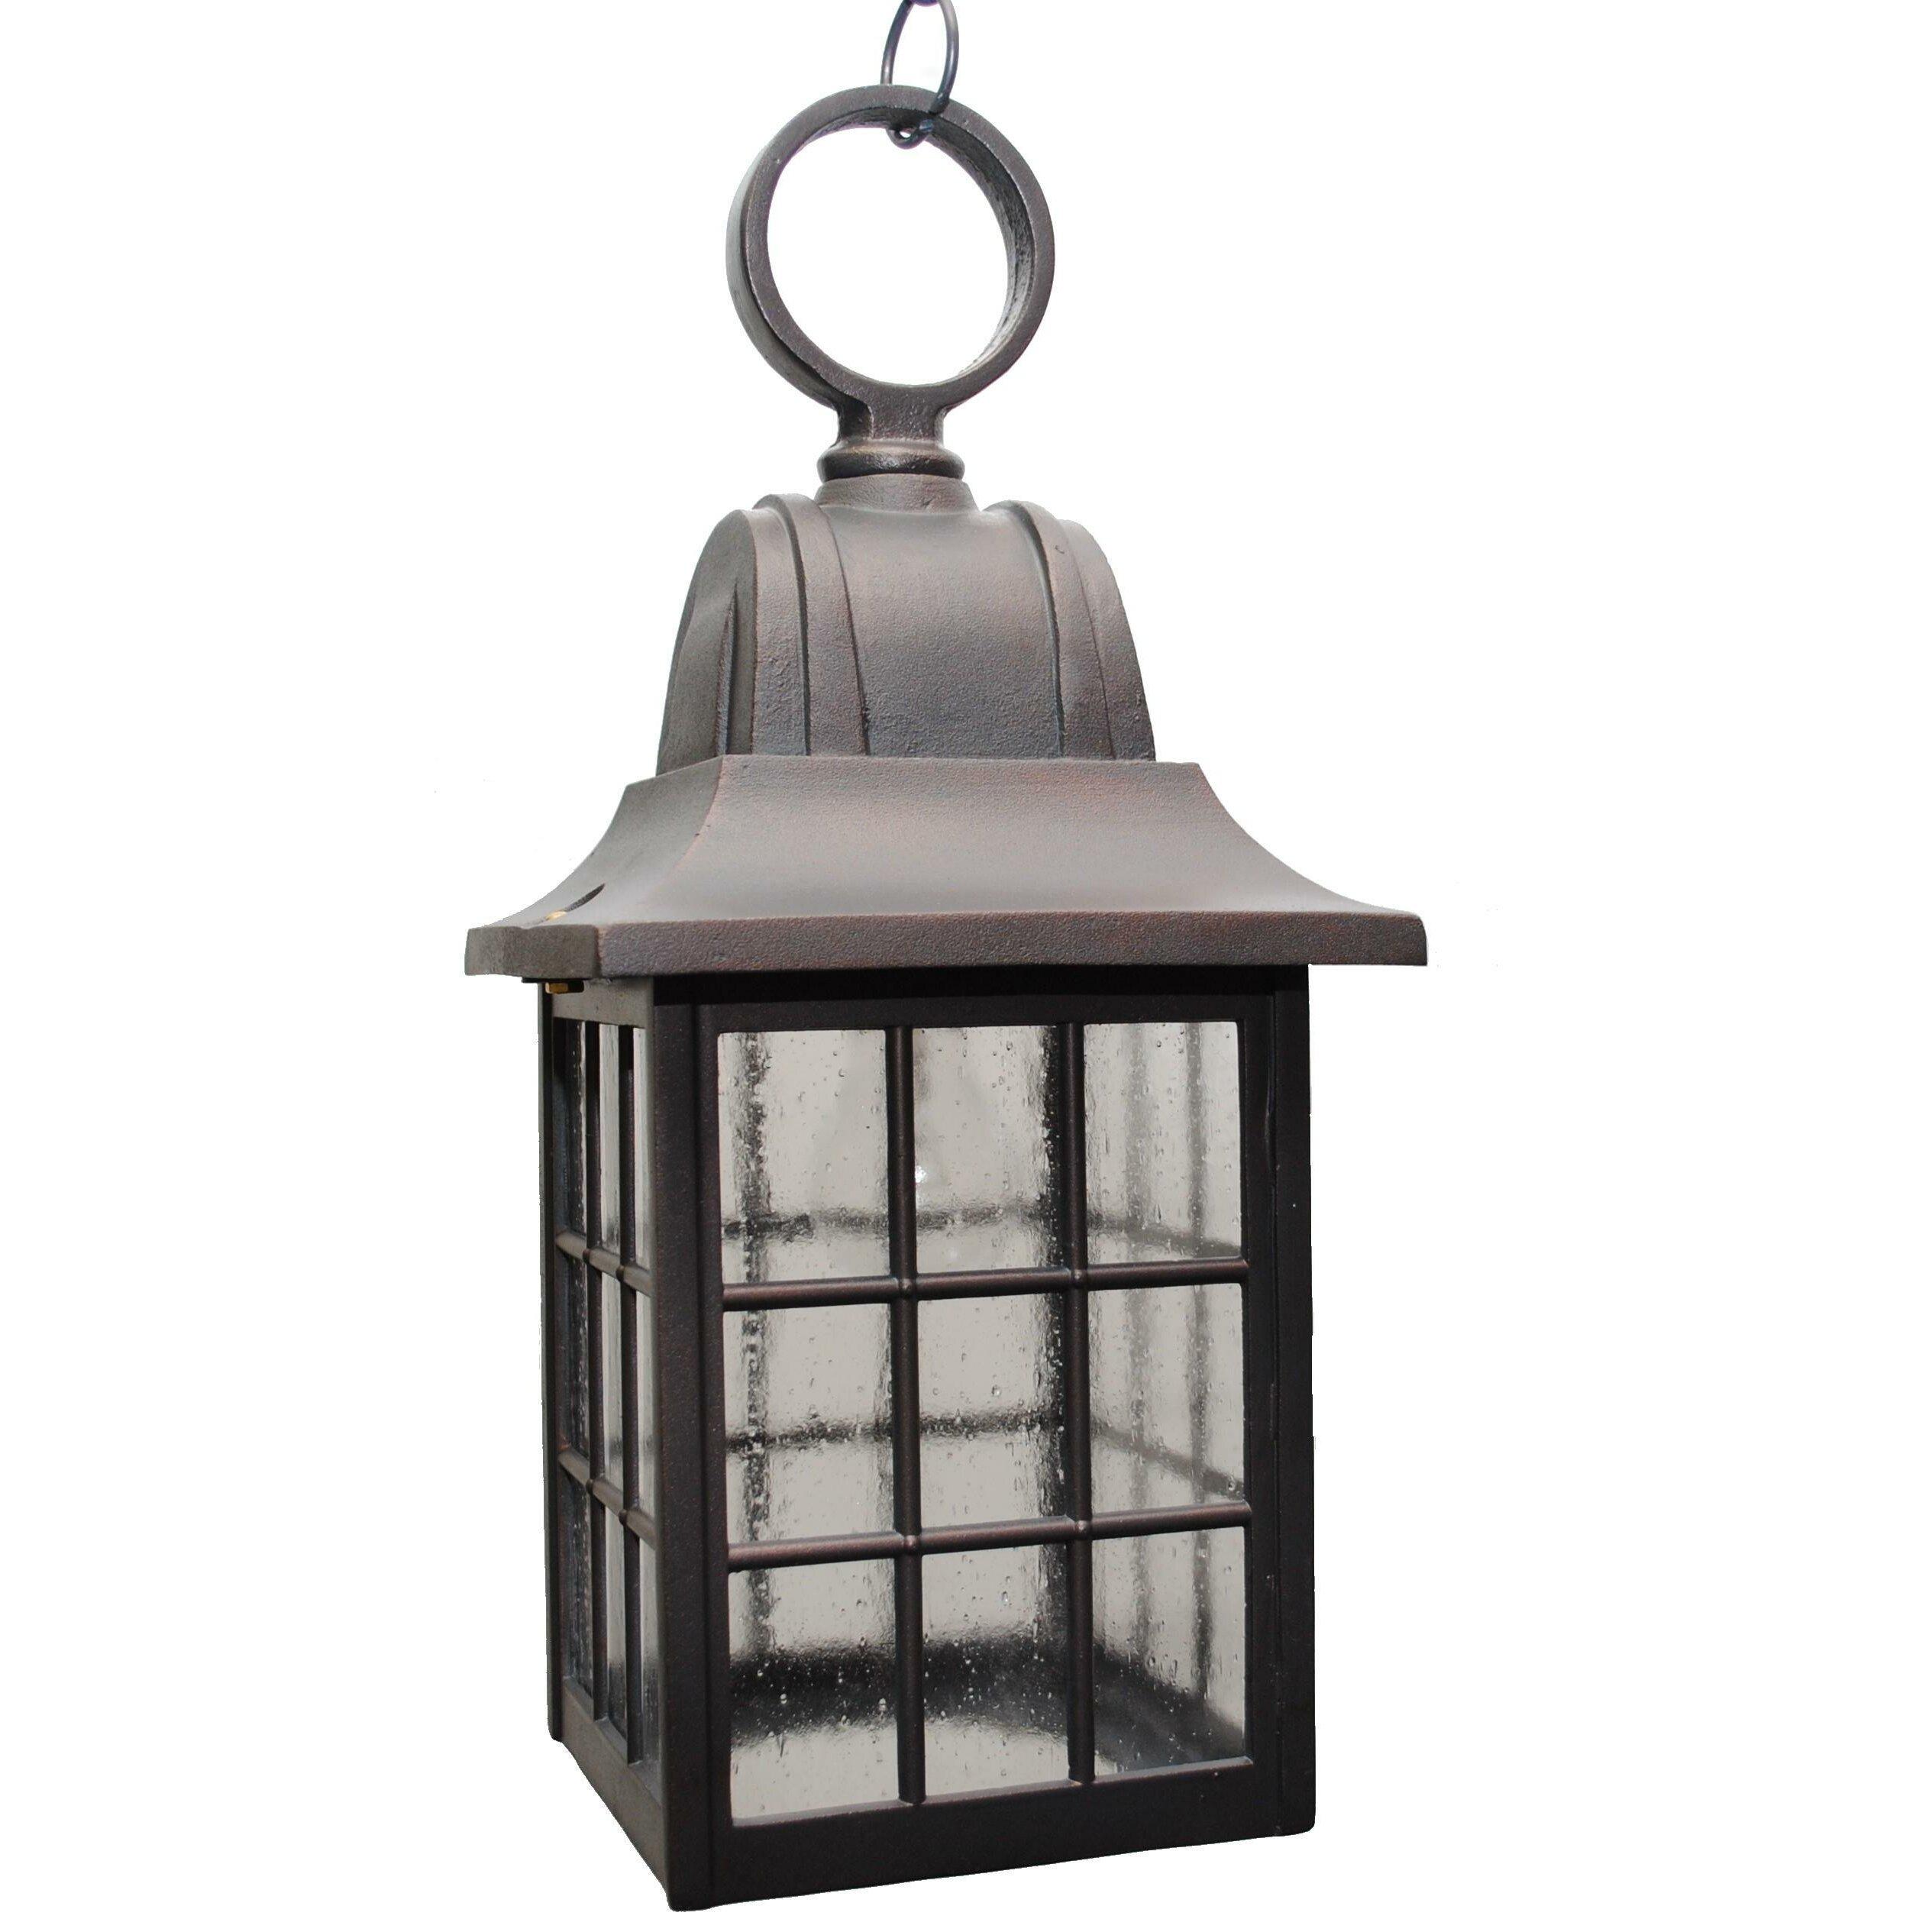 Wayfair Outdoor Hanging Lights: 600 Series 1 Light Outdoor Hanging Lantern